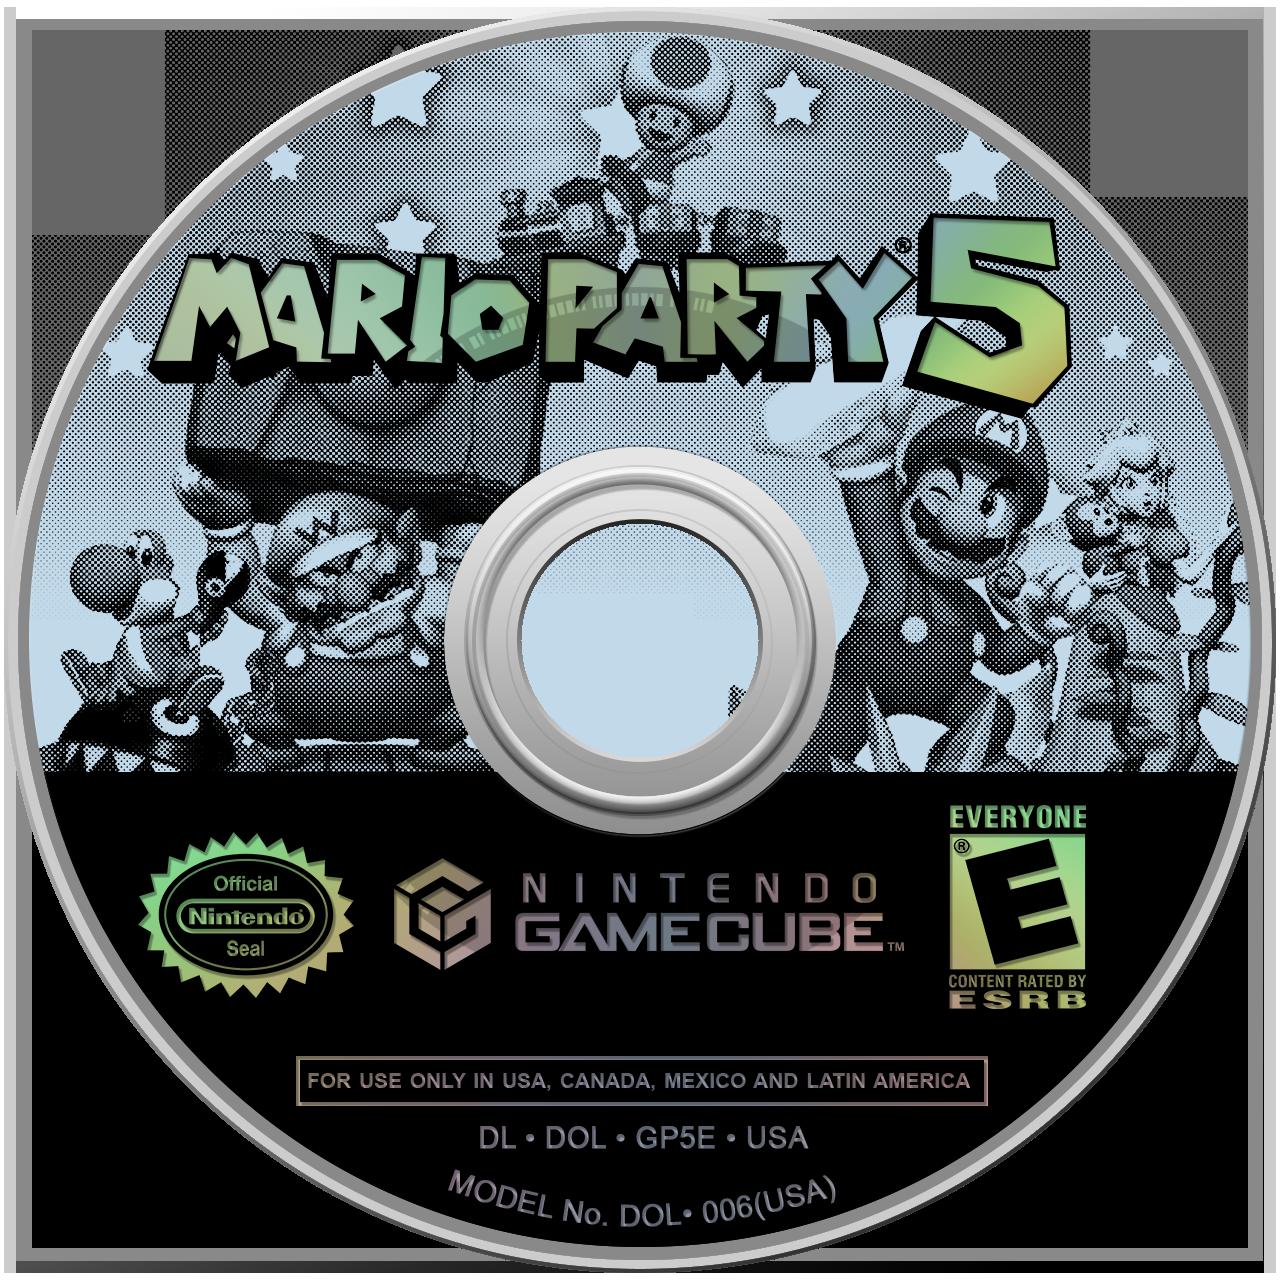 Mario Party 5 Details ...